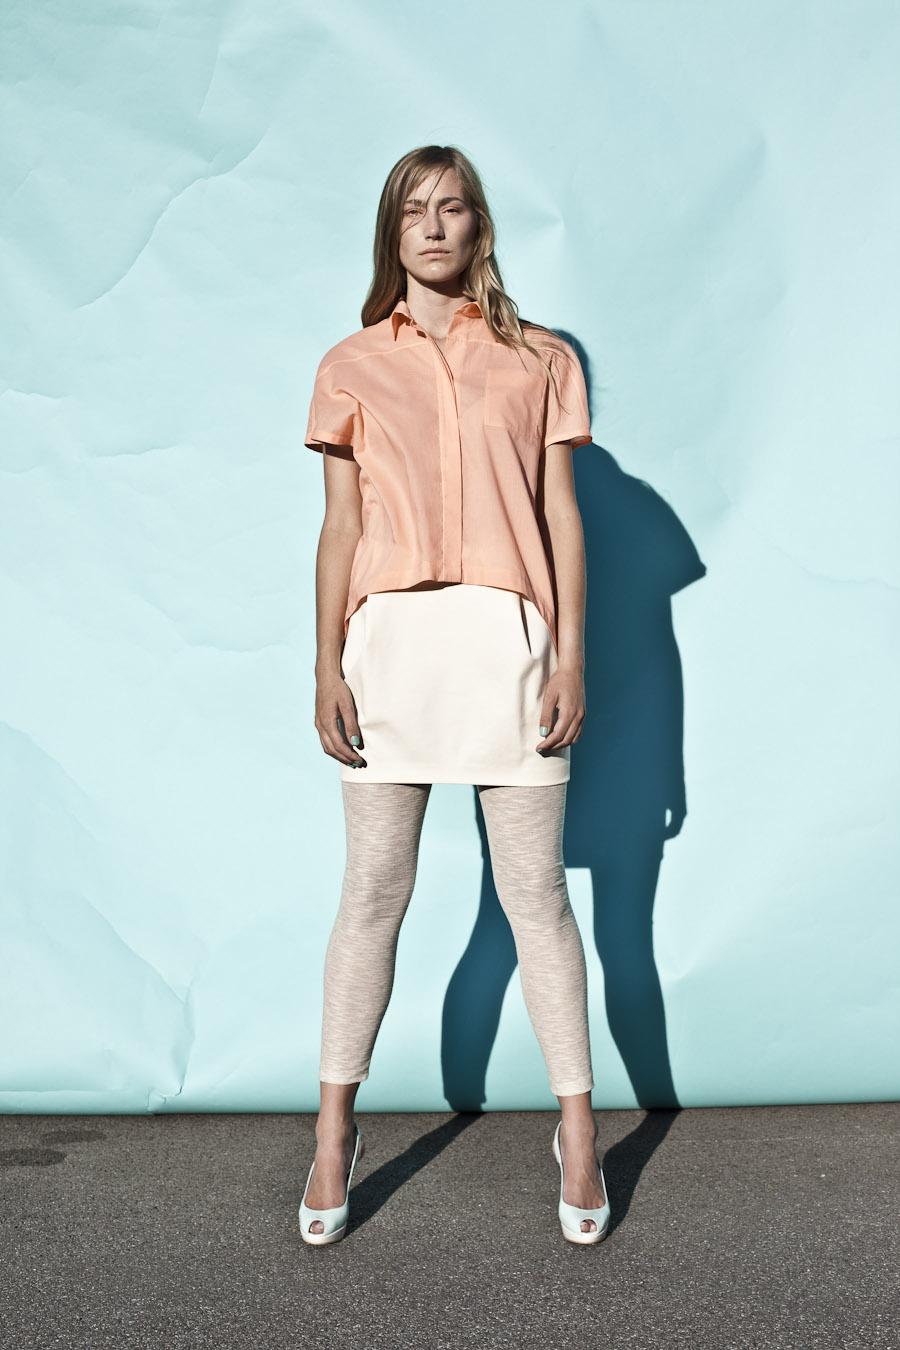 blouse: Rubin |  skirt: Alabaster |  leggin: Apatit